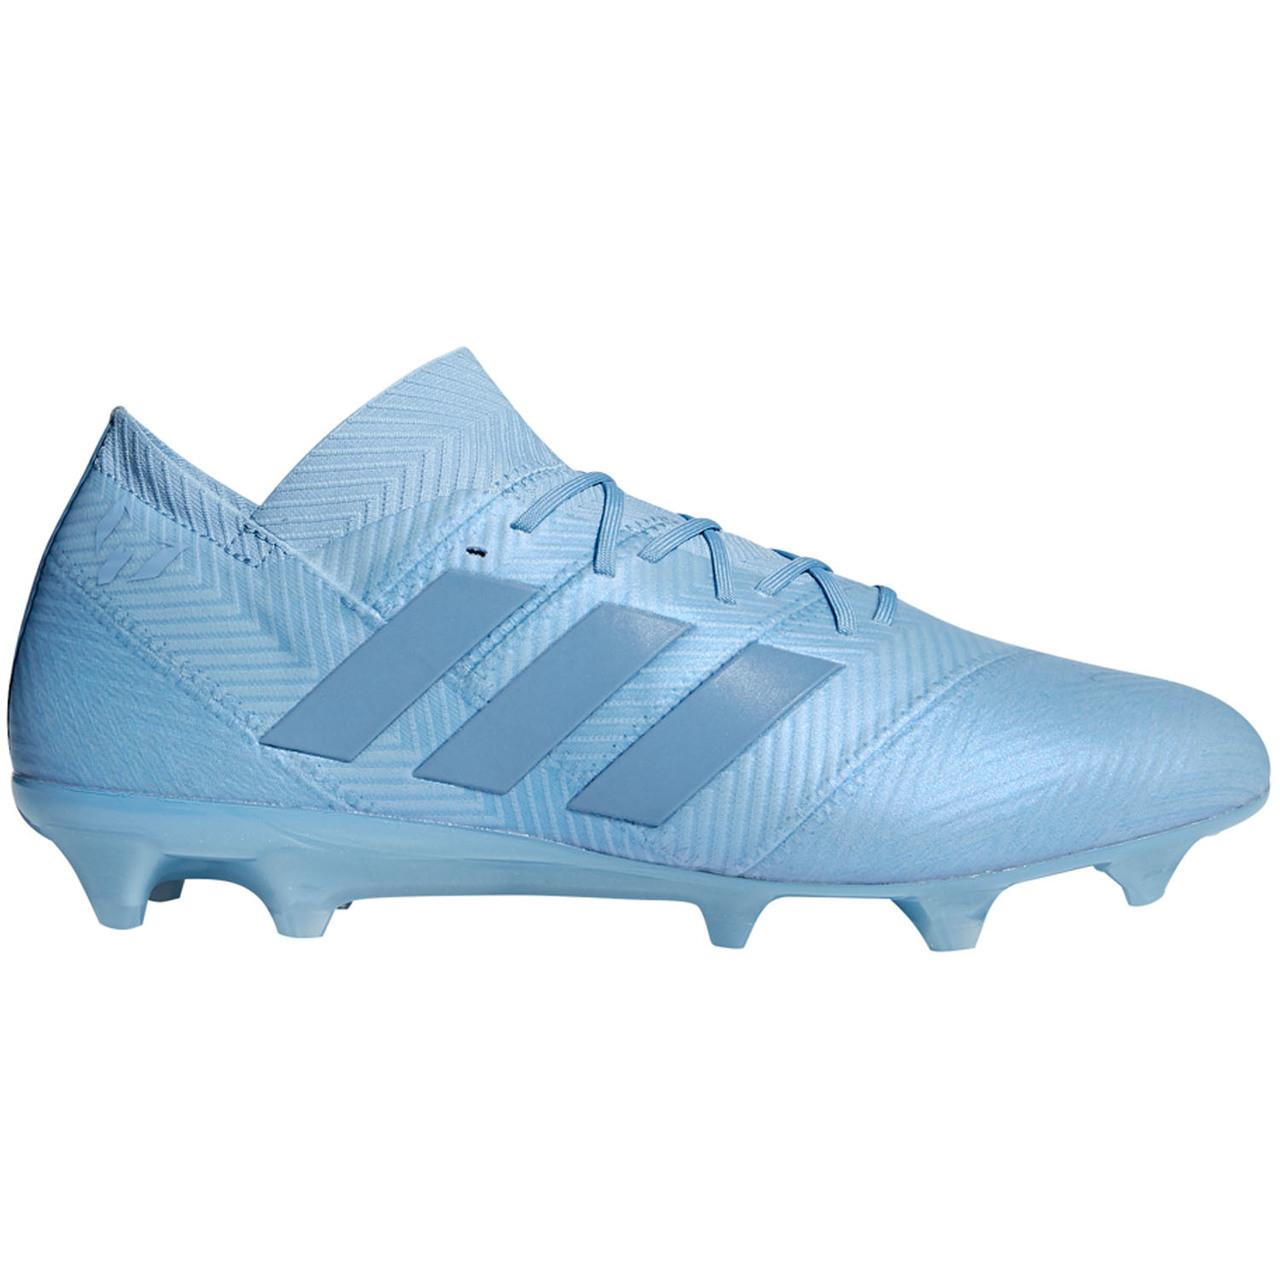 fed15601786 ADIDAS NEMEZIZ MESSI 18.1 FG ASH BLU - Soccer Plus